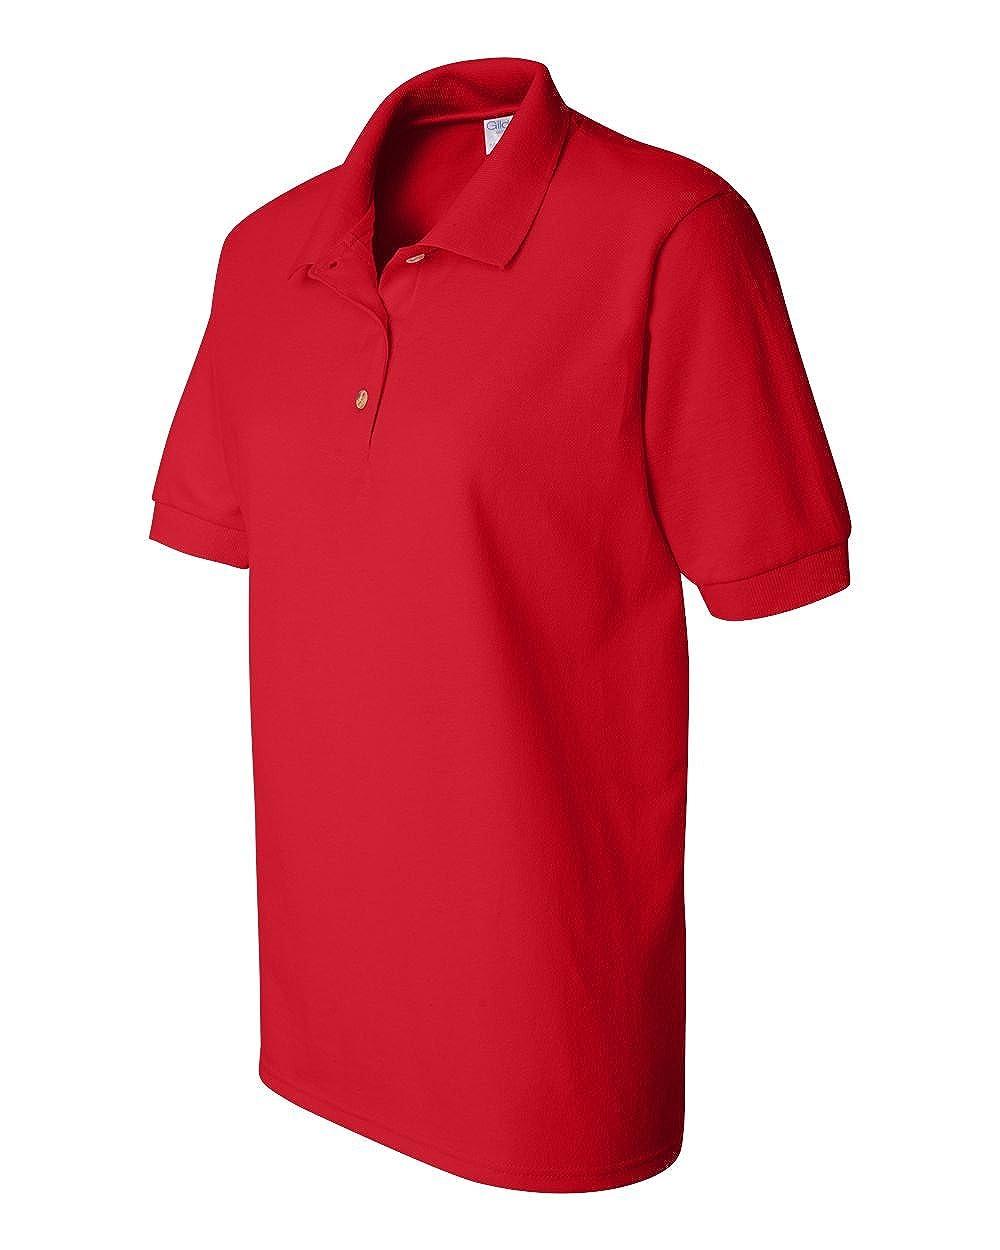 Ladies Ultra Cotton Pique Knit Sport Shirt Gildan 3800L